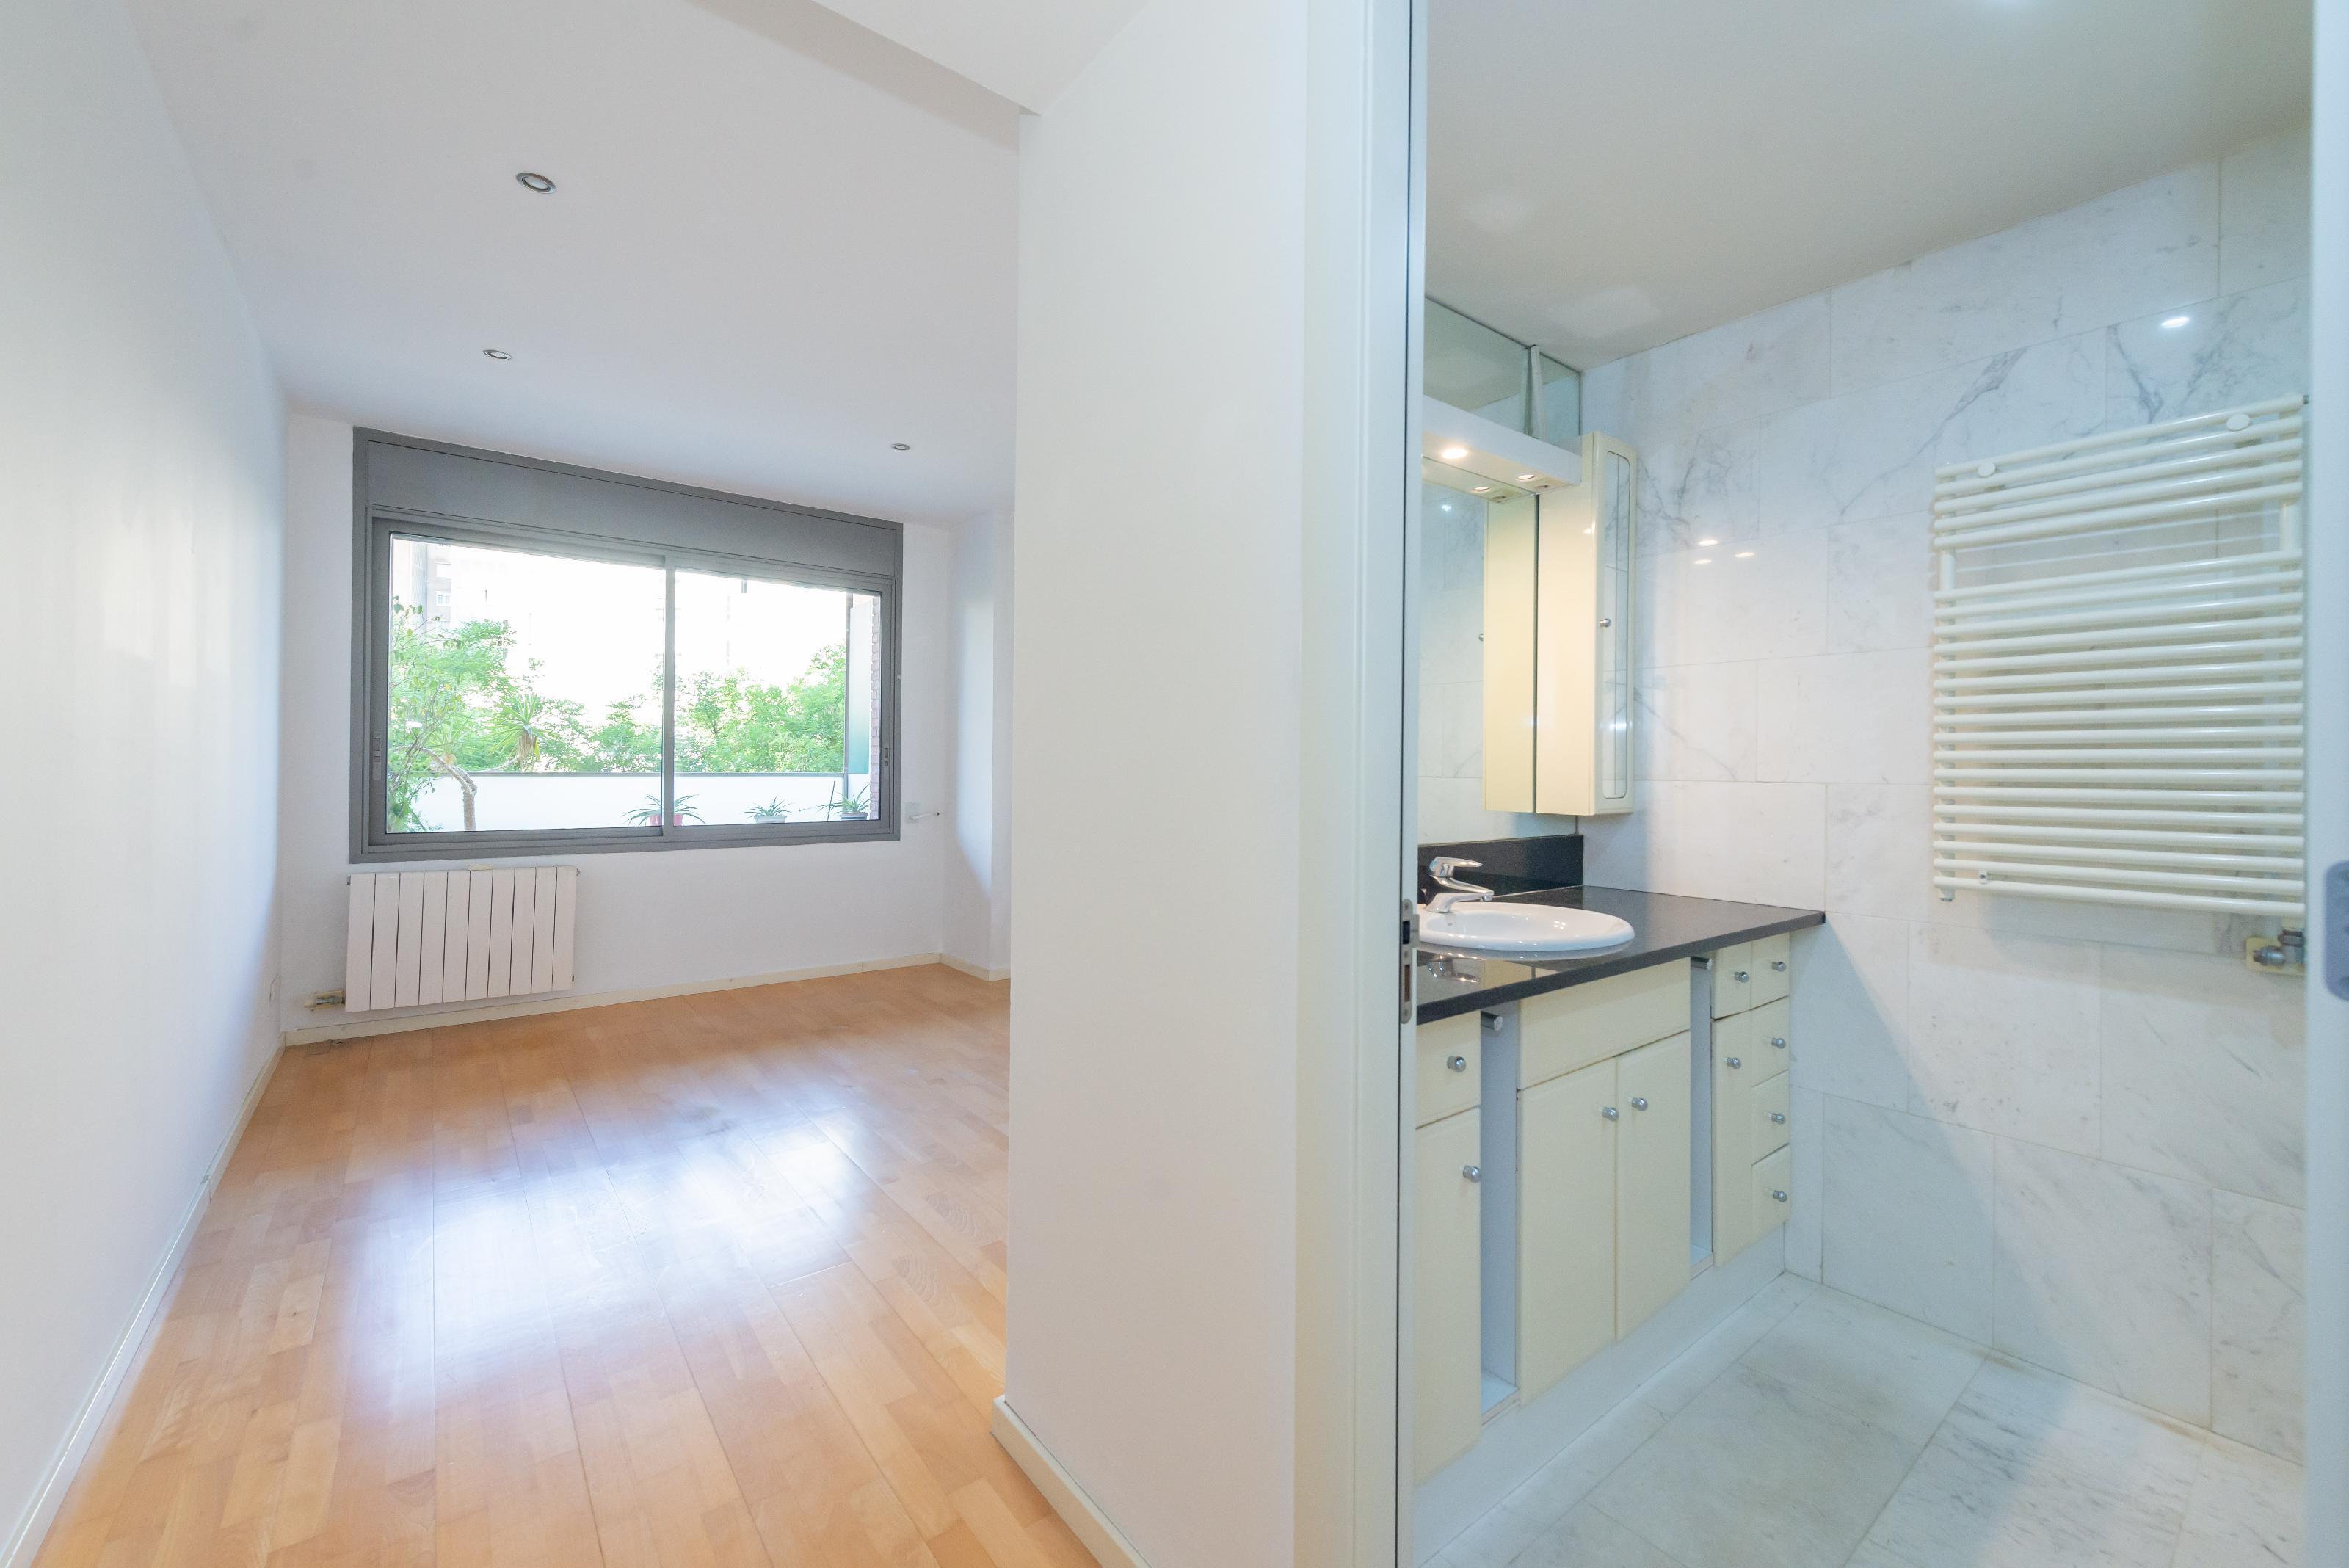 251446 Flat for sale in Sarrià-Sant Gervasi, Tres Torres 21